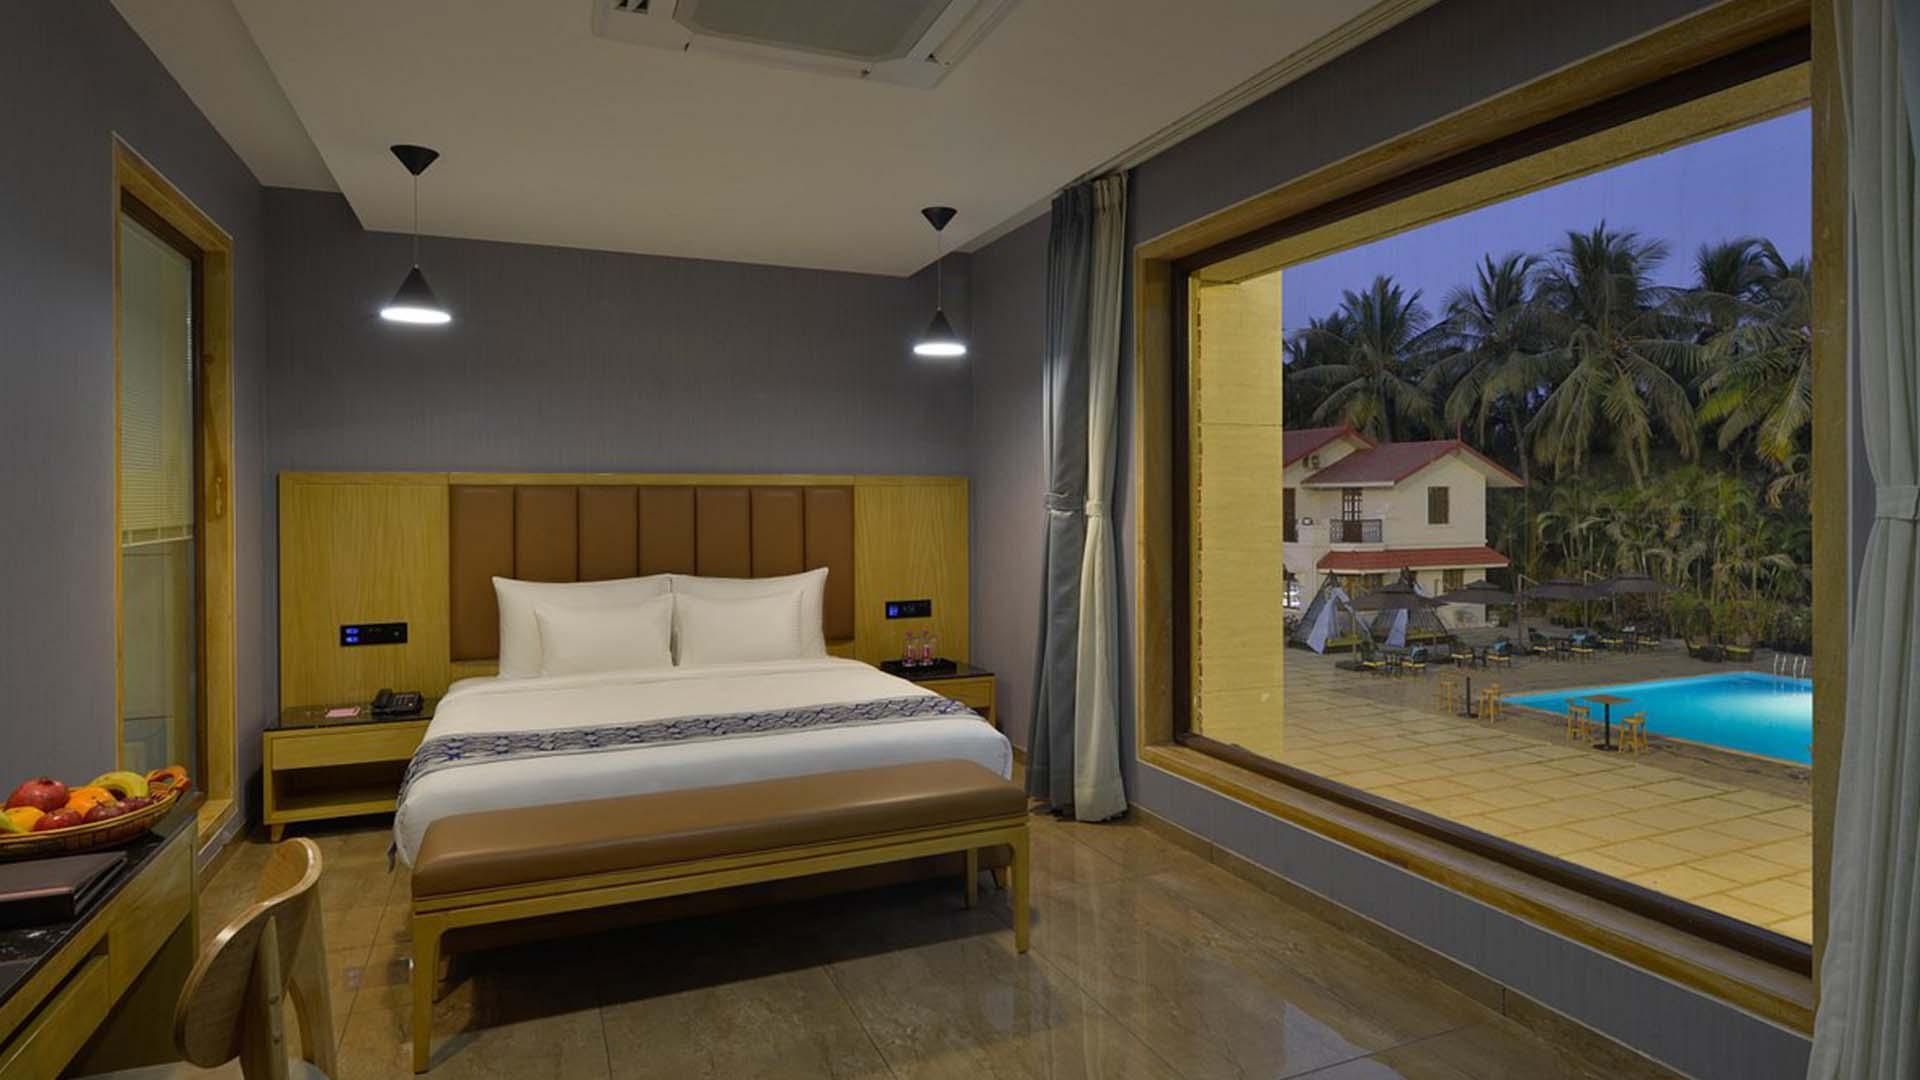 Premier Room  image 1 at Treat Beach Resort & Spa Gholvad by Thane, Maharashtra, India